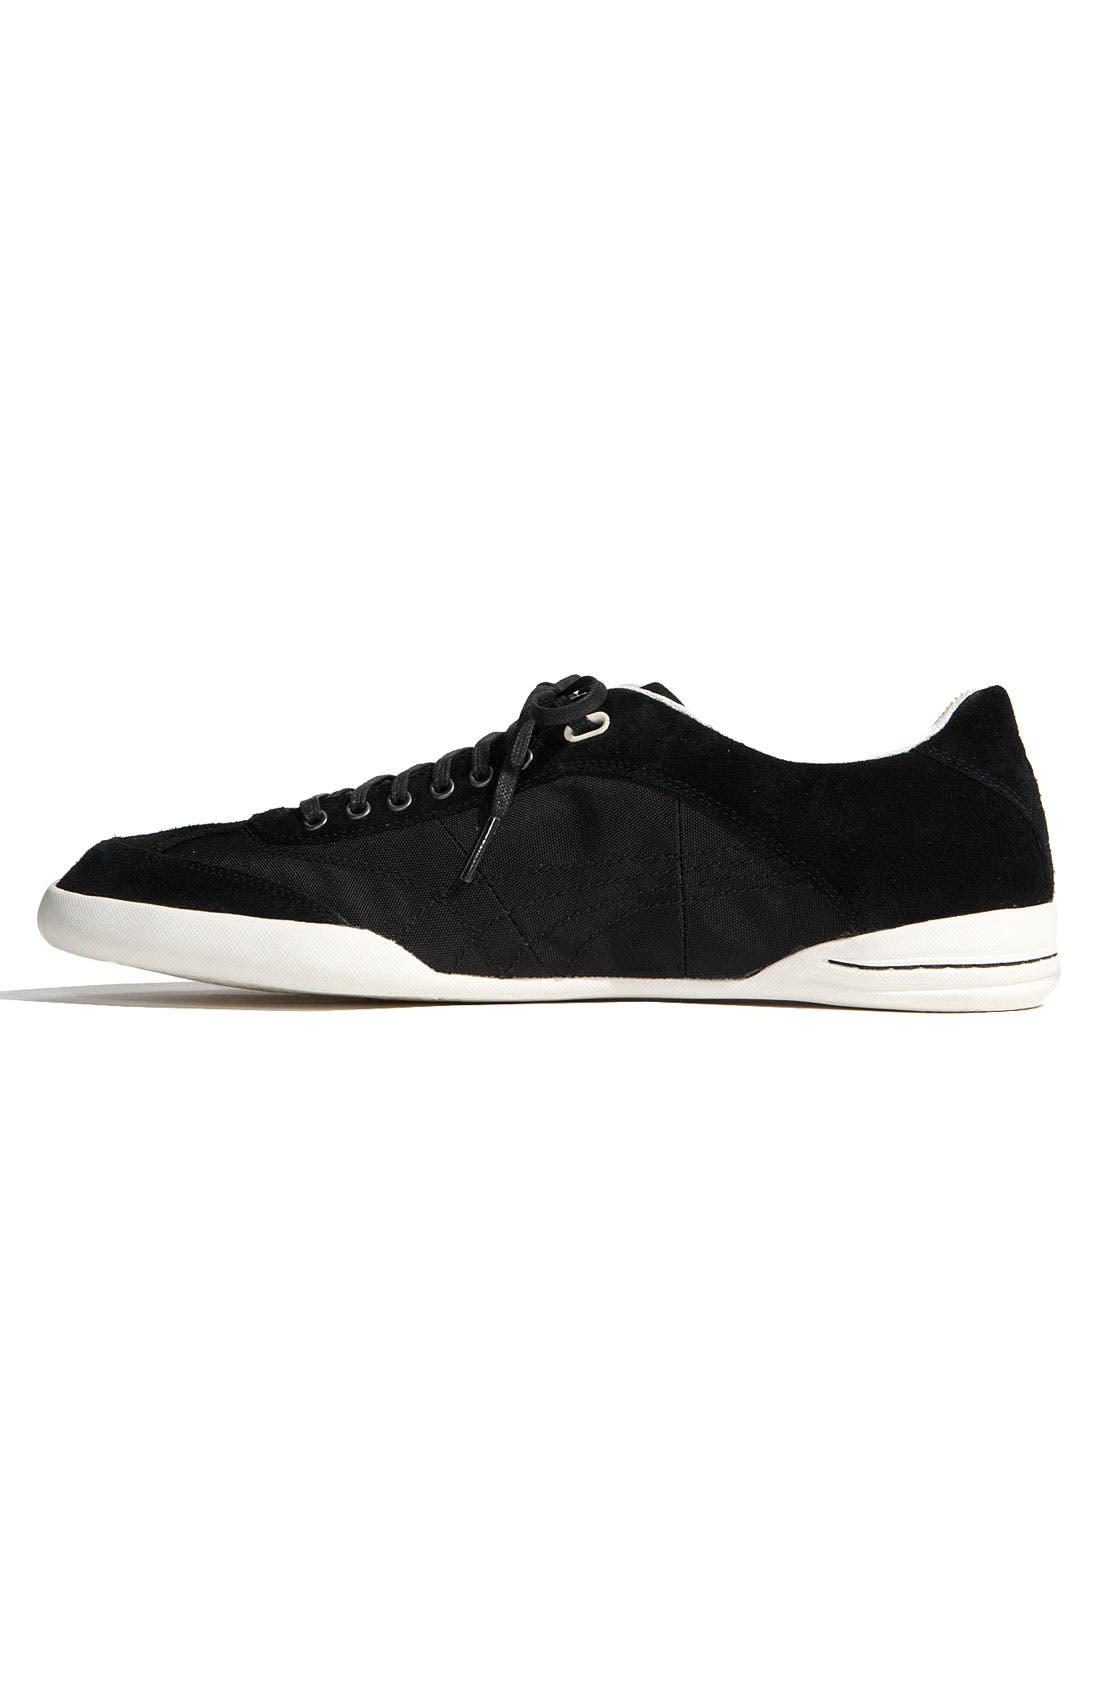 'Blackstation Standpunkt' Sneaker,                             Alternate thumbnail 4, color,                             001